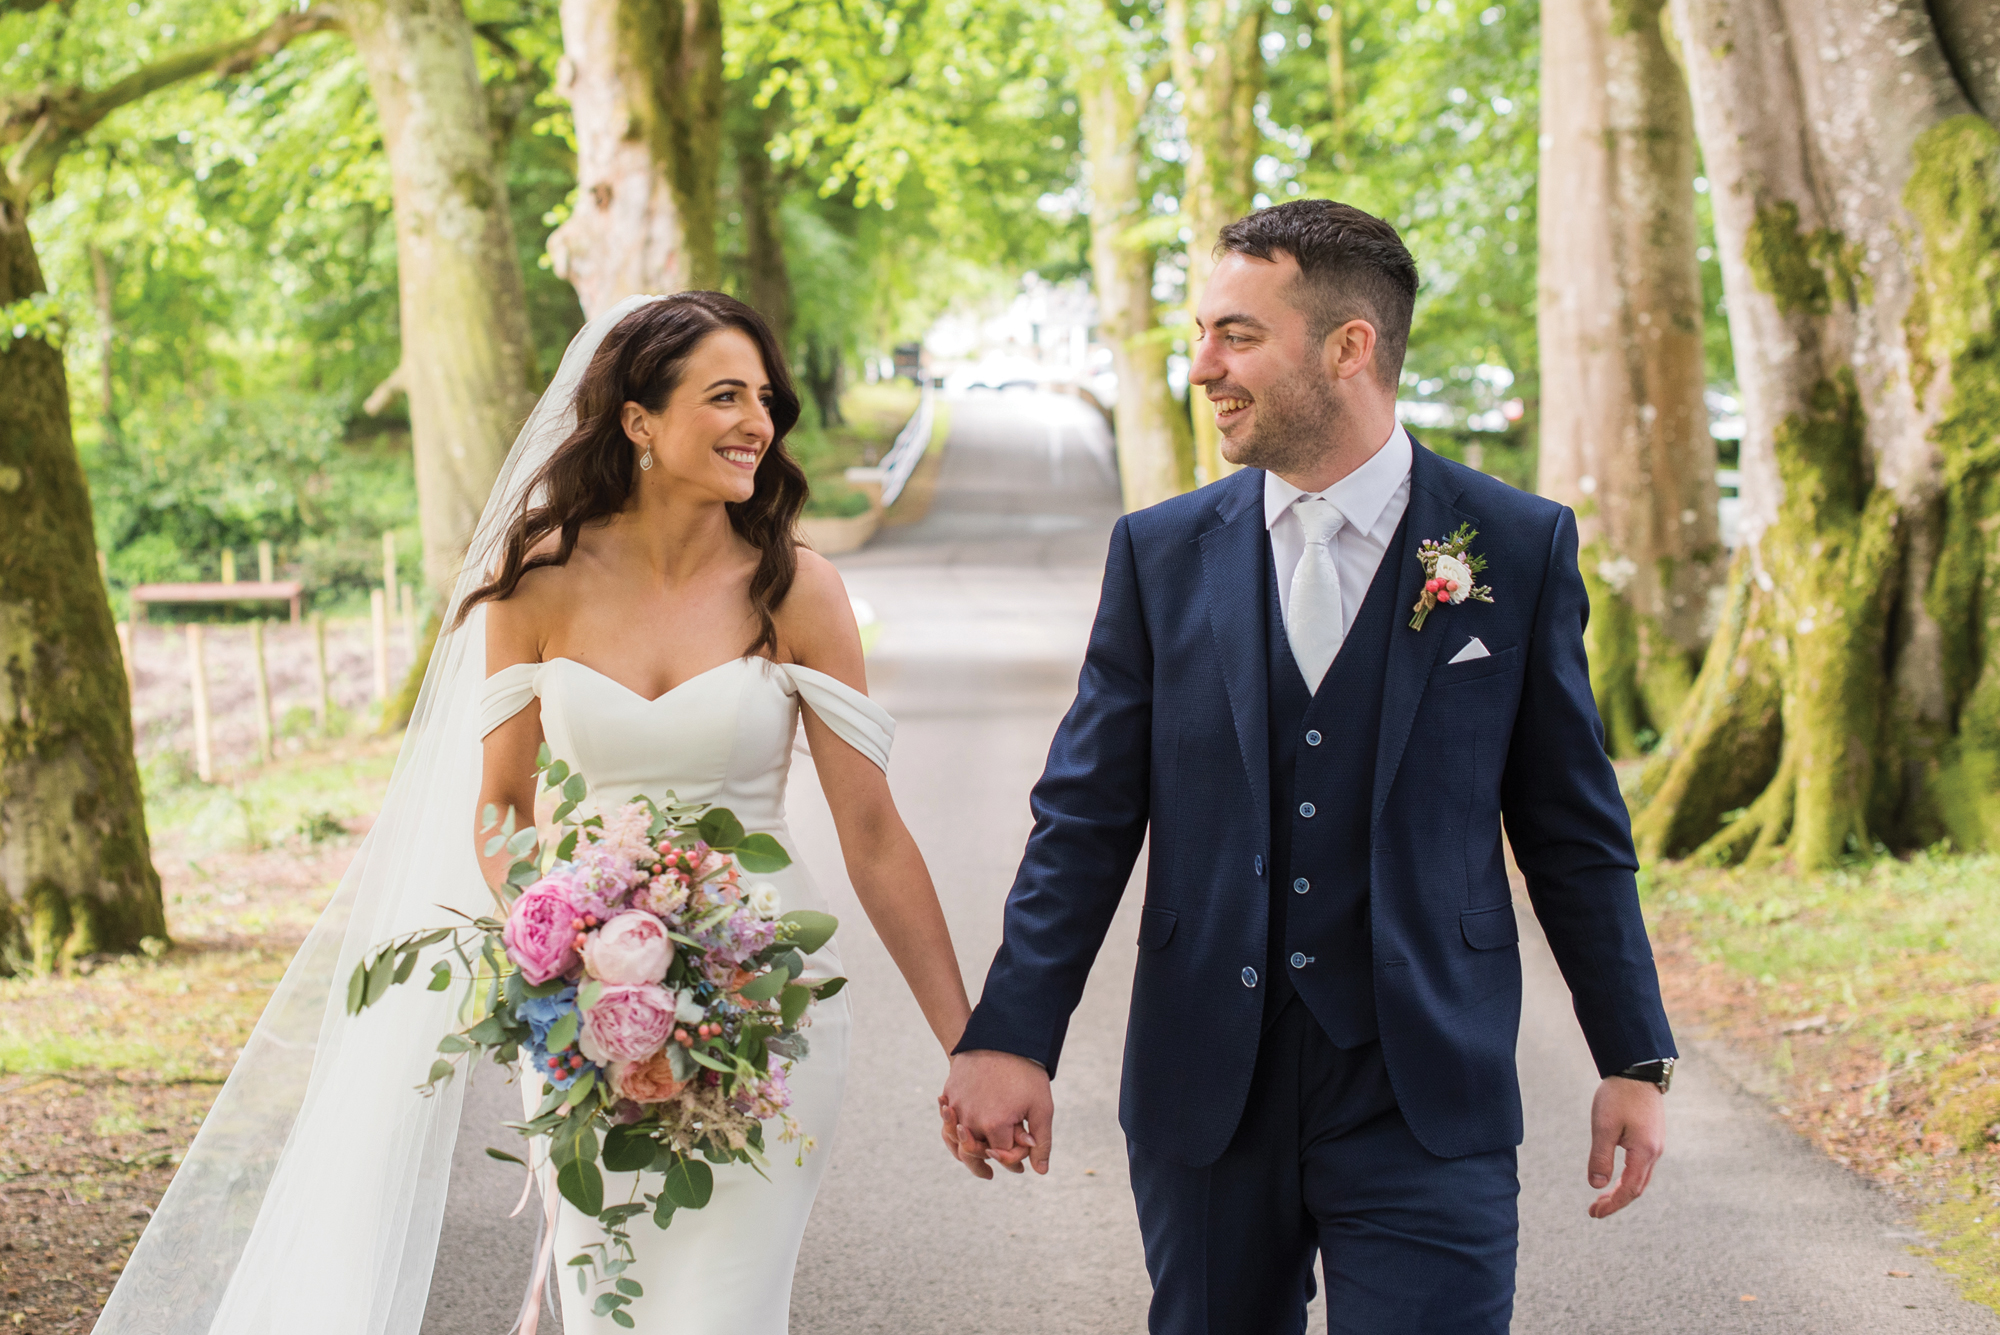 mark_barton_Wedding_photographer_northern_ireland_1.jpg